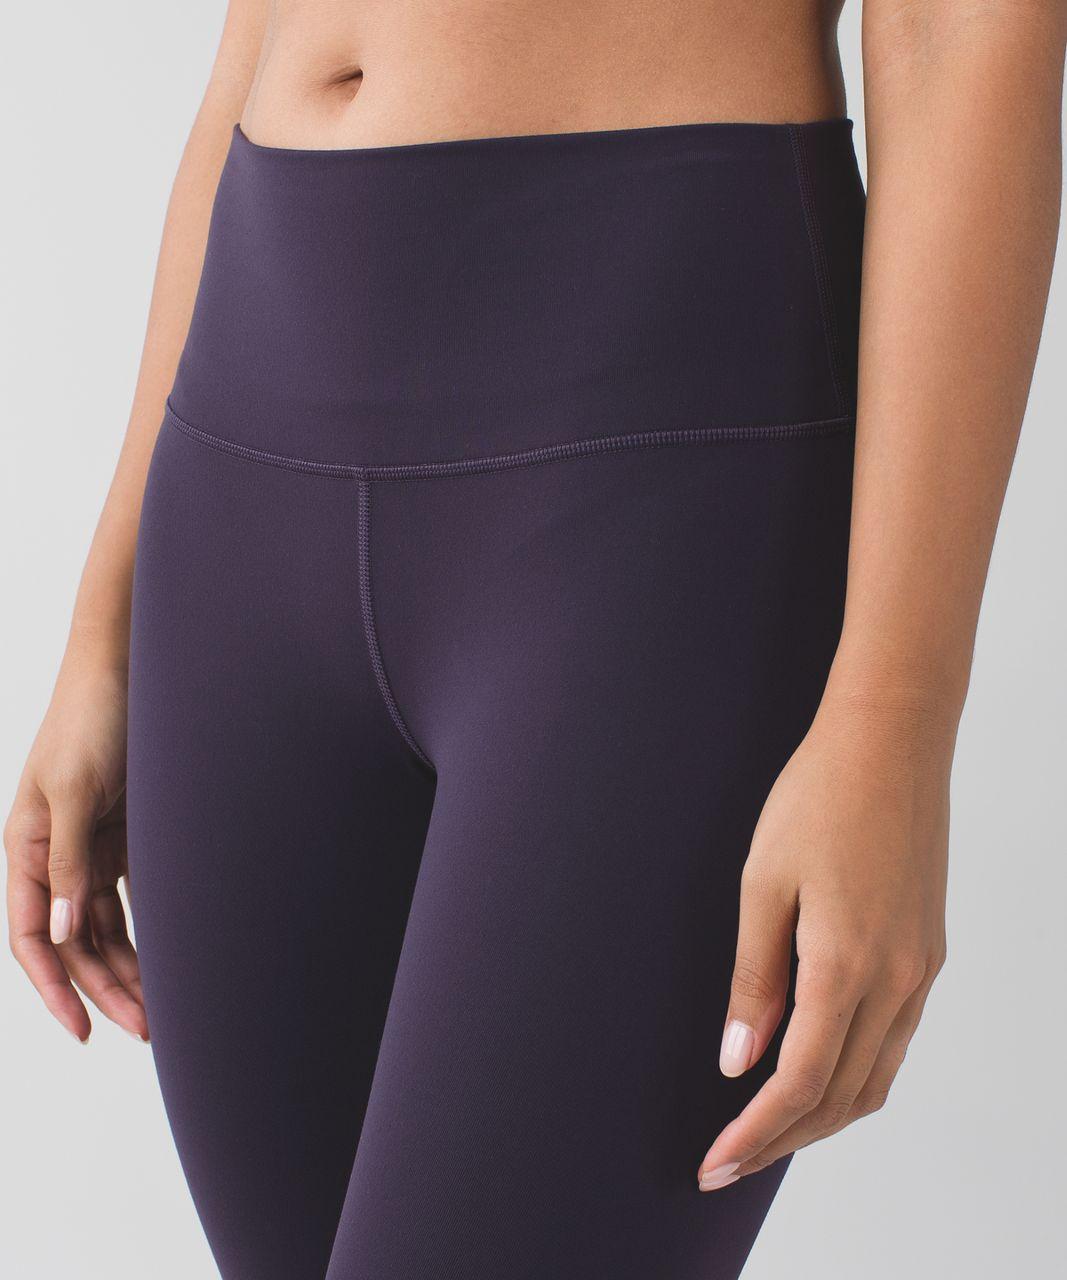 Lululemon High Times Pant *Full-On Luon - Black Grape